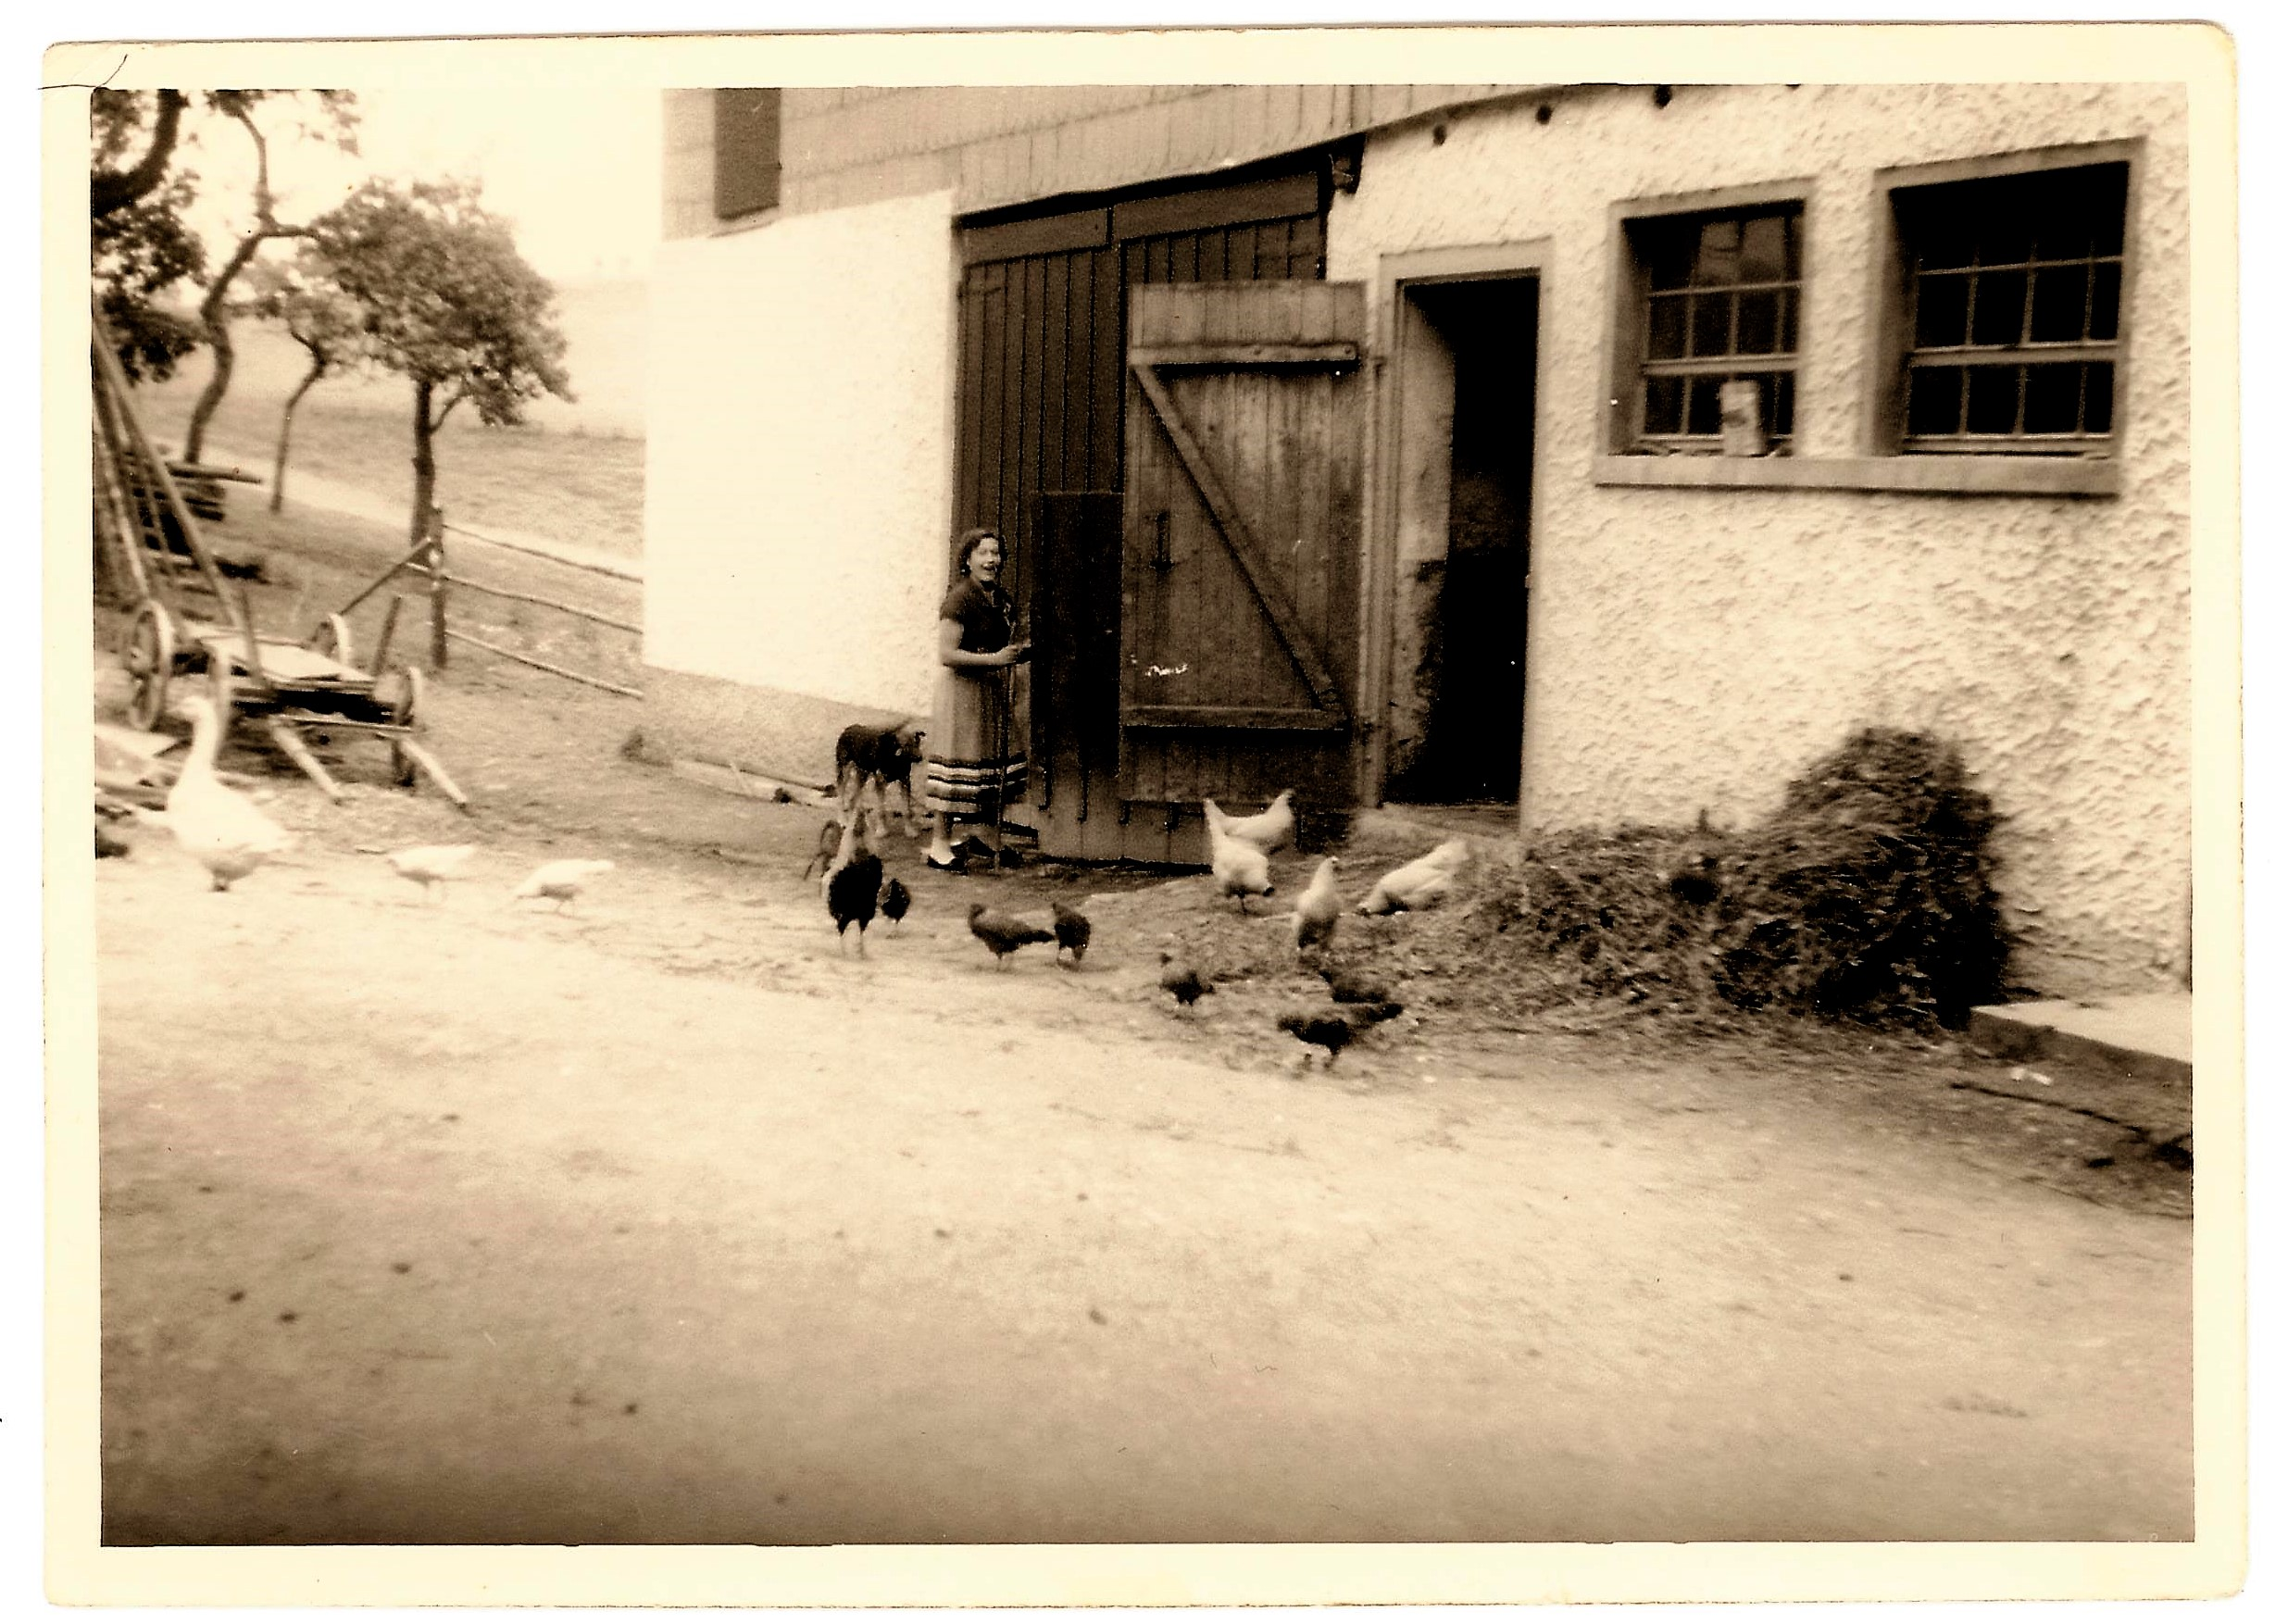 Barons Hof mit Hühnern